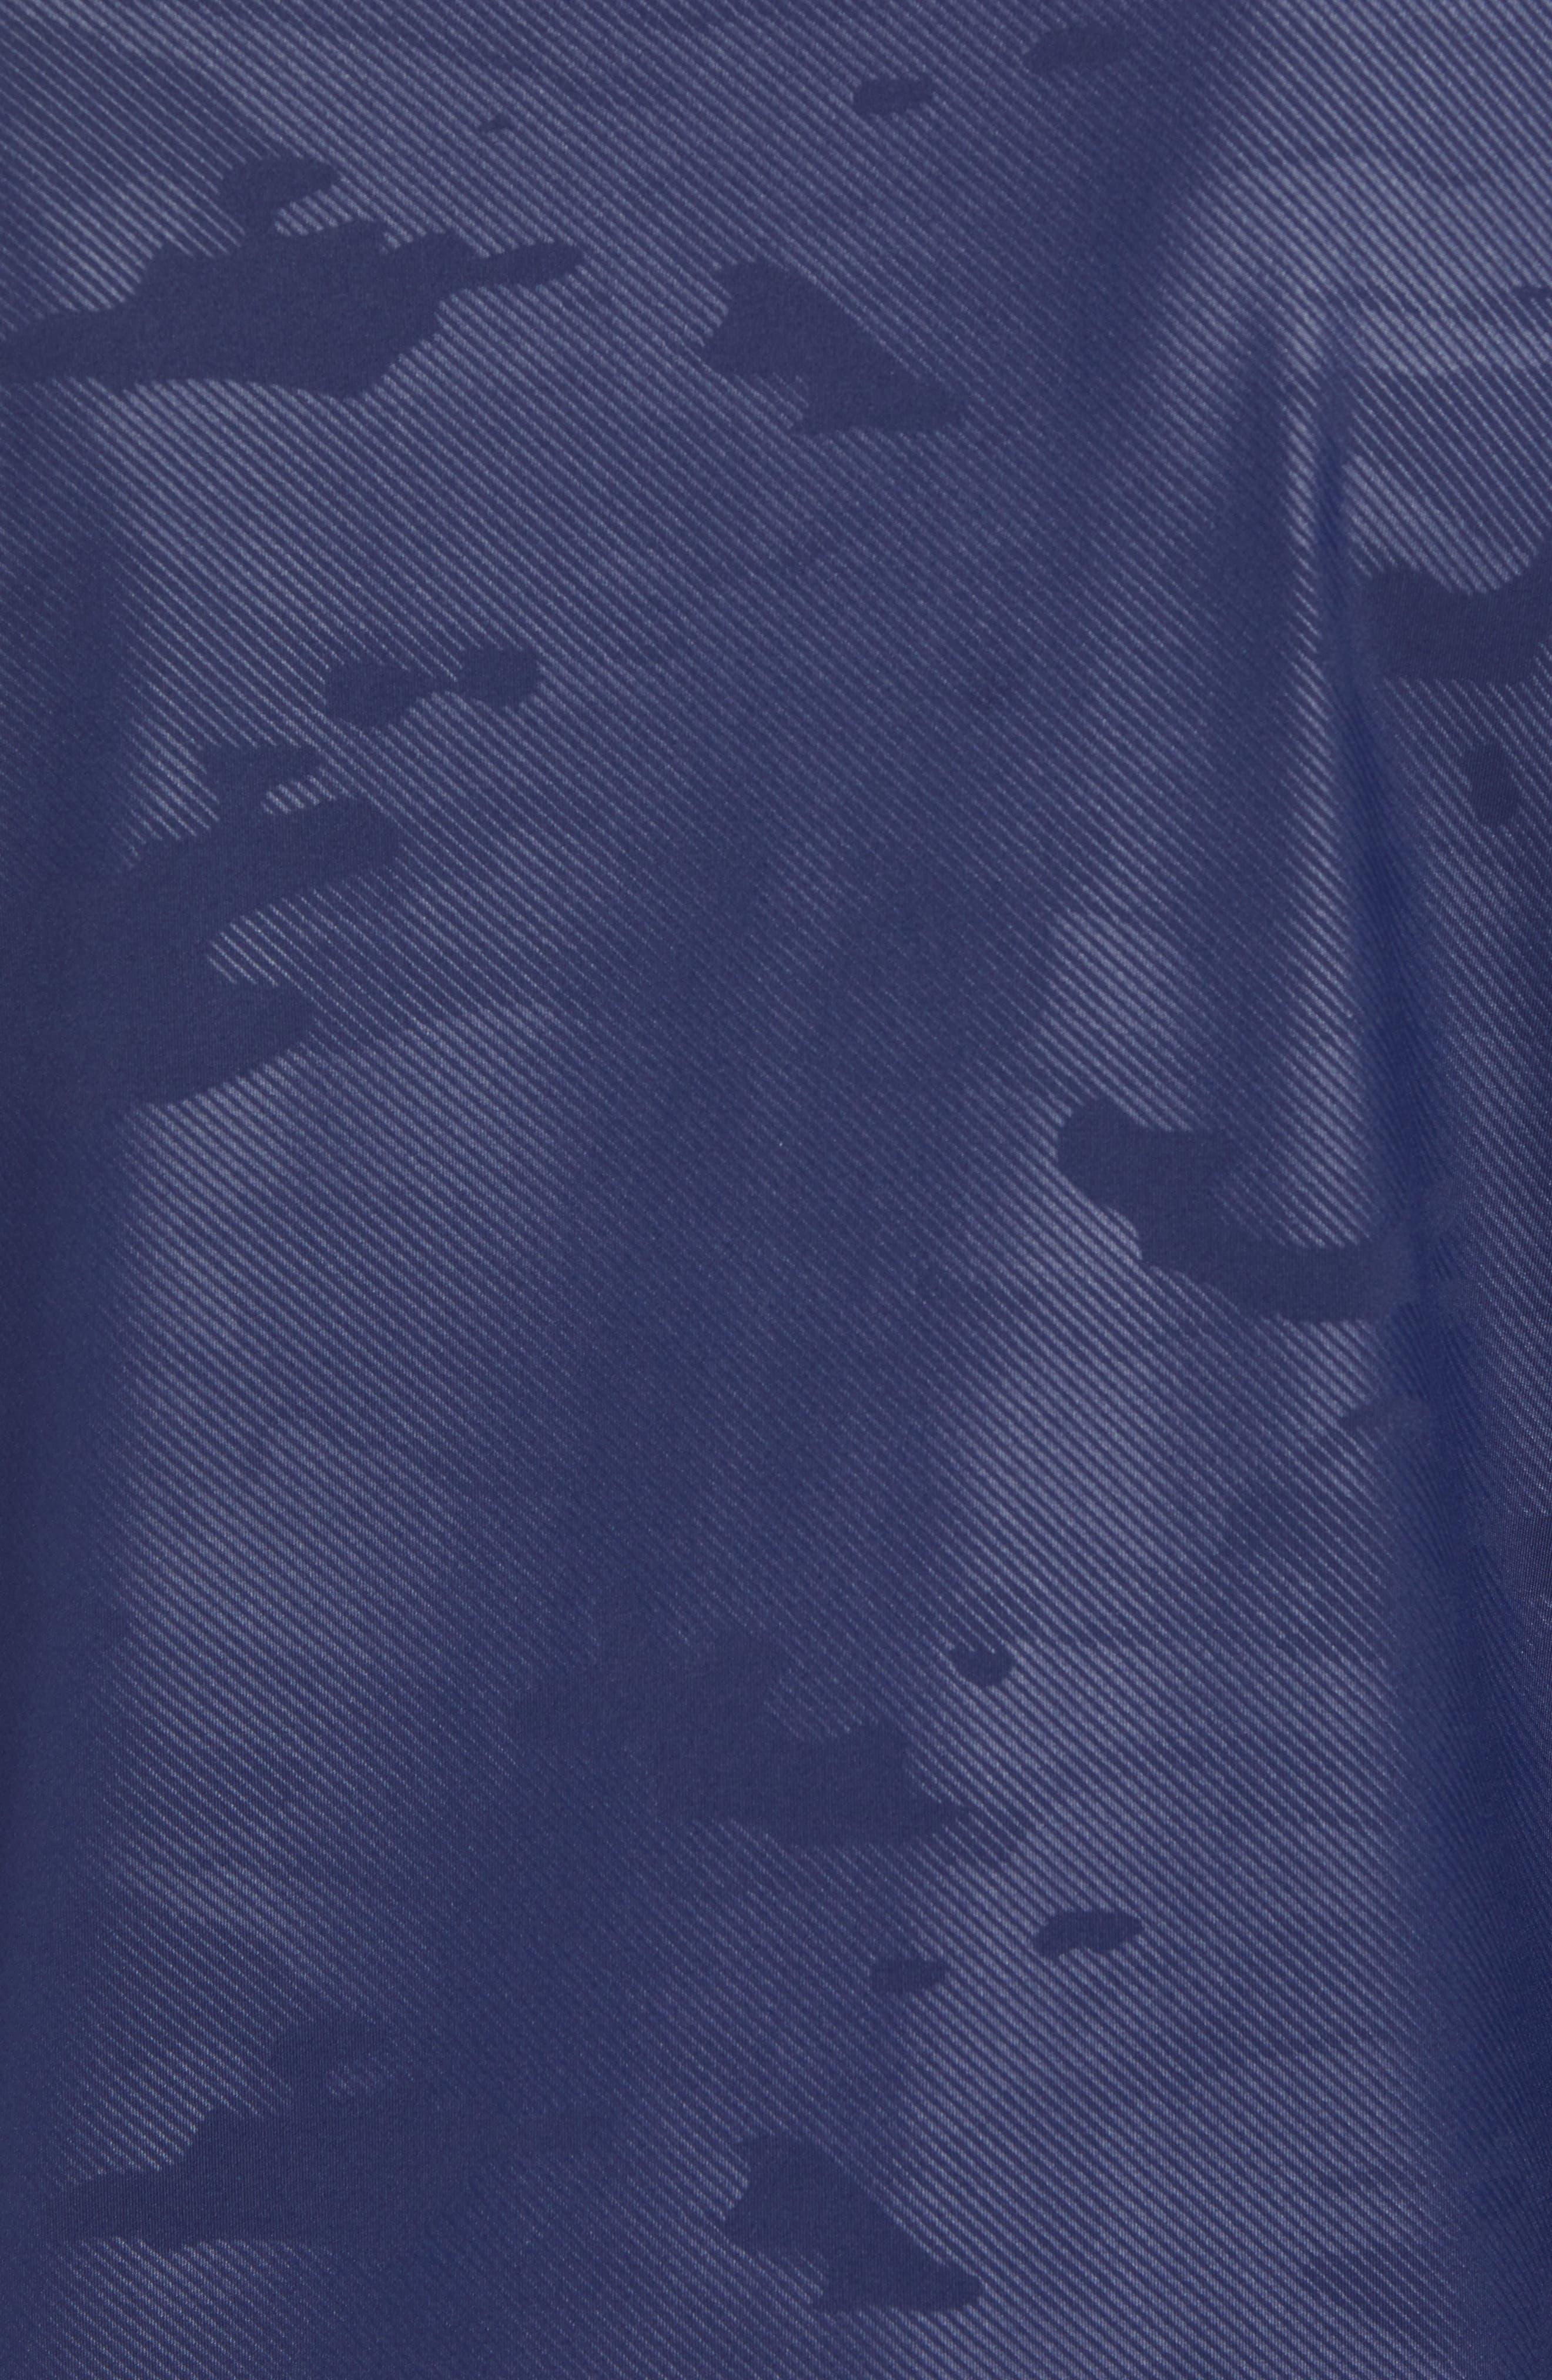 Camo Regular Fit Quarter-Zip Pullover,                             Alternate thumbnail 6, color,                             400